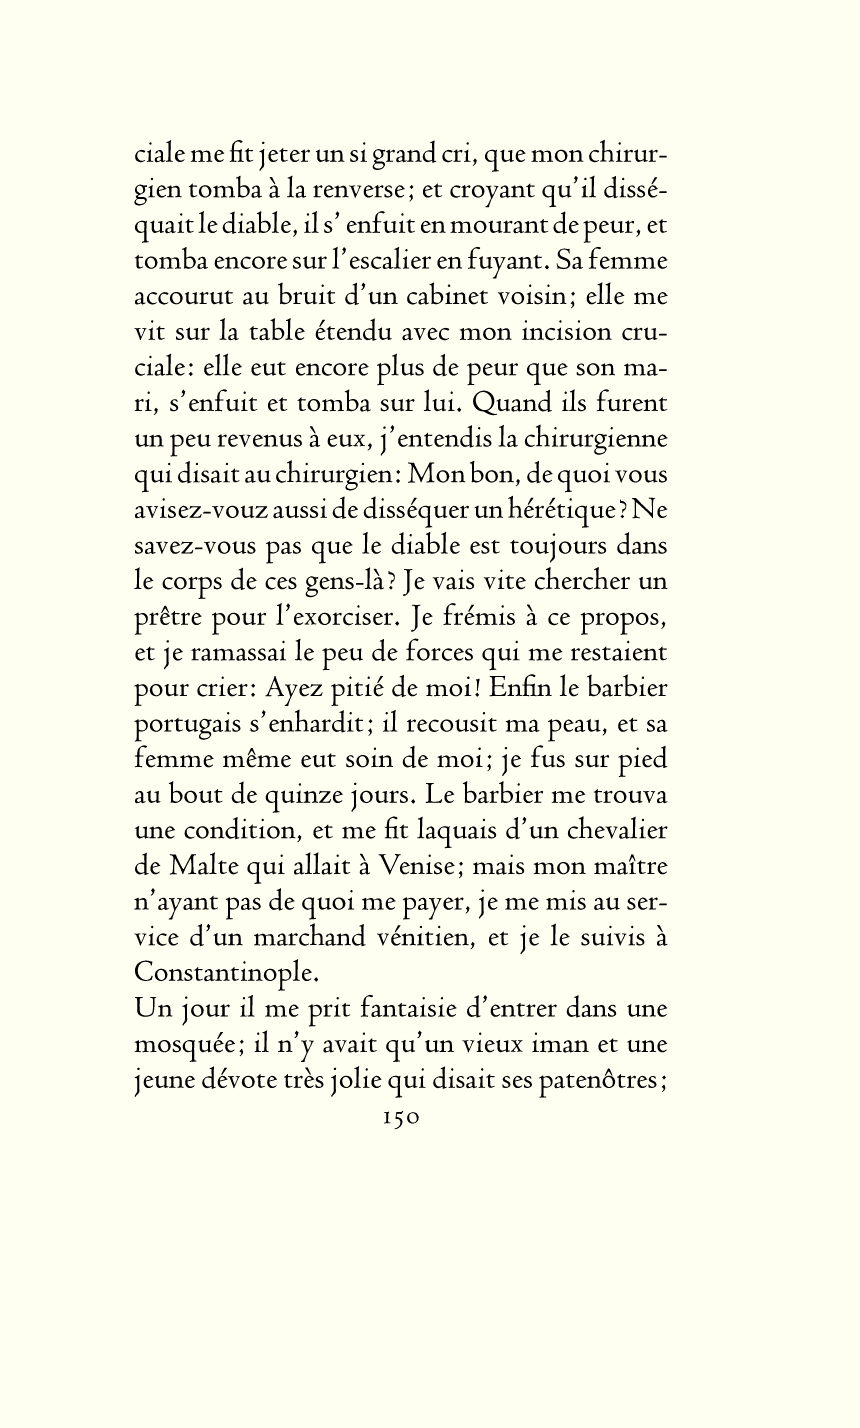 Centaur VAL (Valdonega Aesthetic Line) 14–16pt Size · Hot Metal Page Facsimile [p.150, Candide ou l'optimisme, Officina Bodoni, 1944]